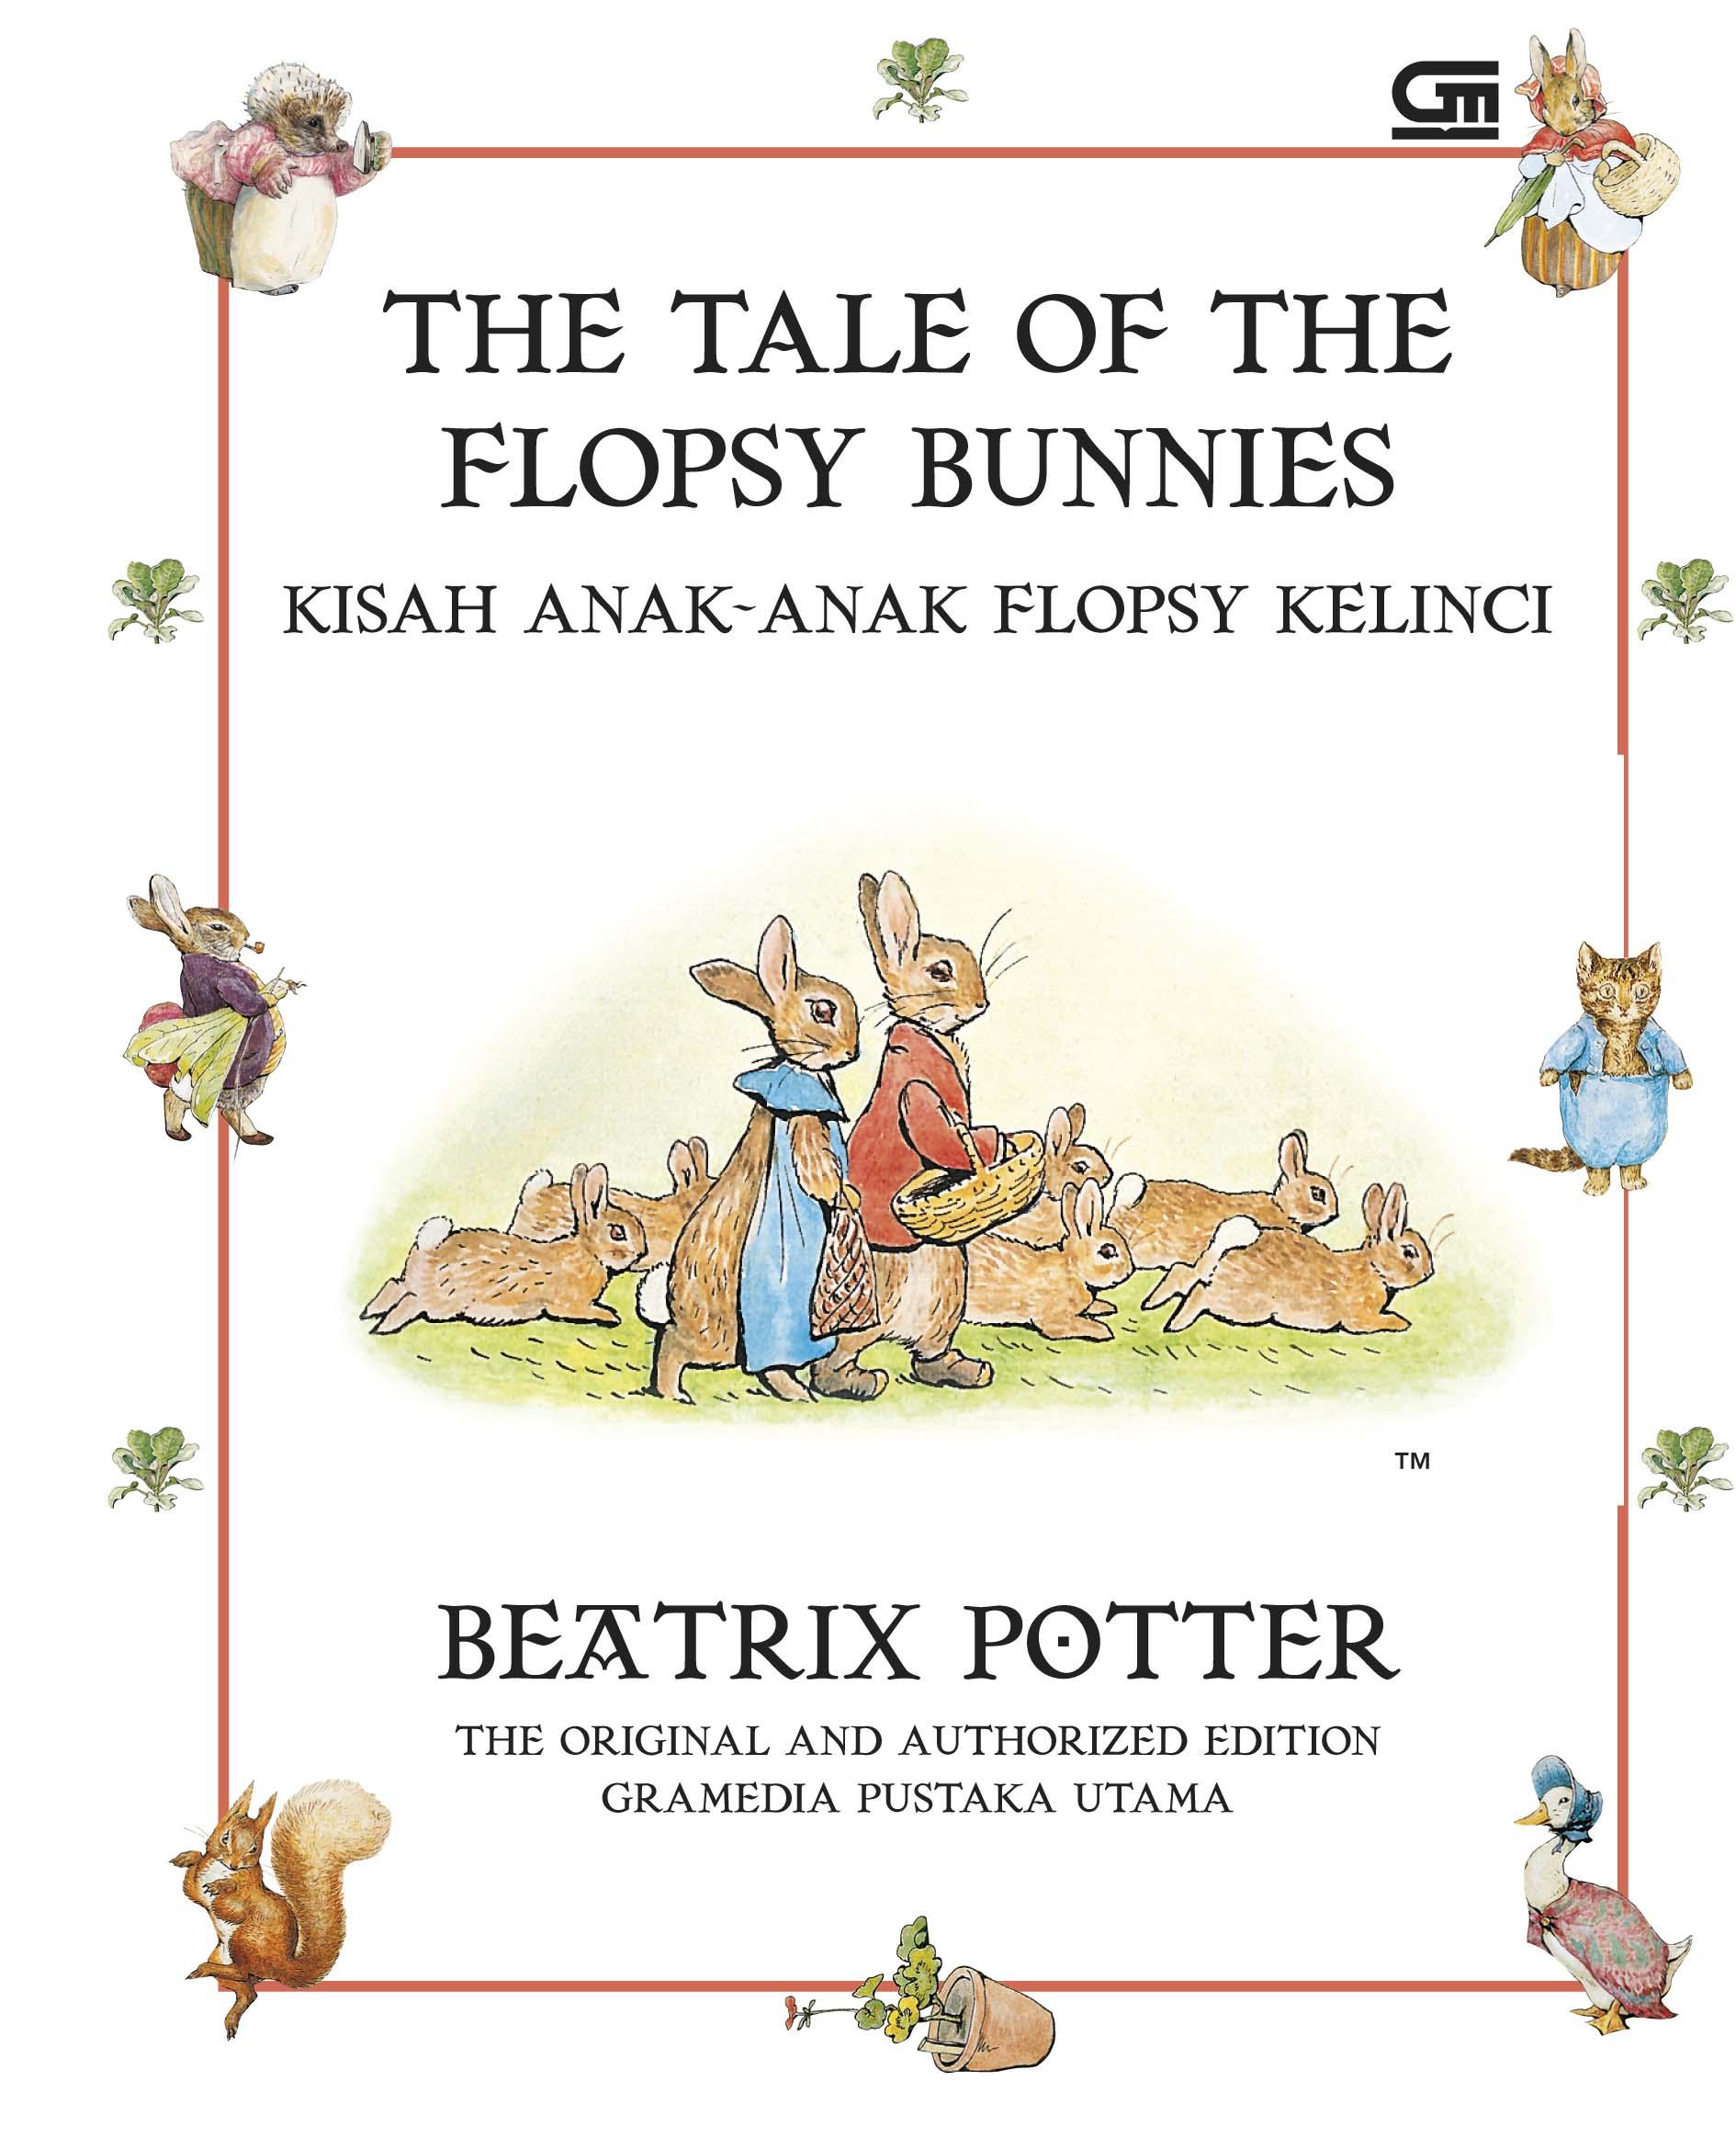 Kisah Anak-Anak Flopsy Kelinci (The Tale of Flopsy Bunnies)